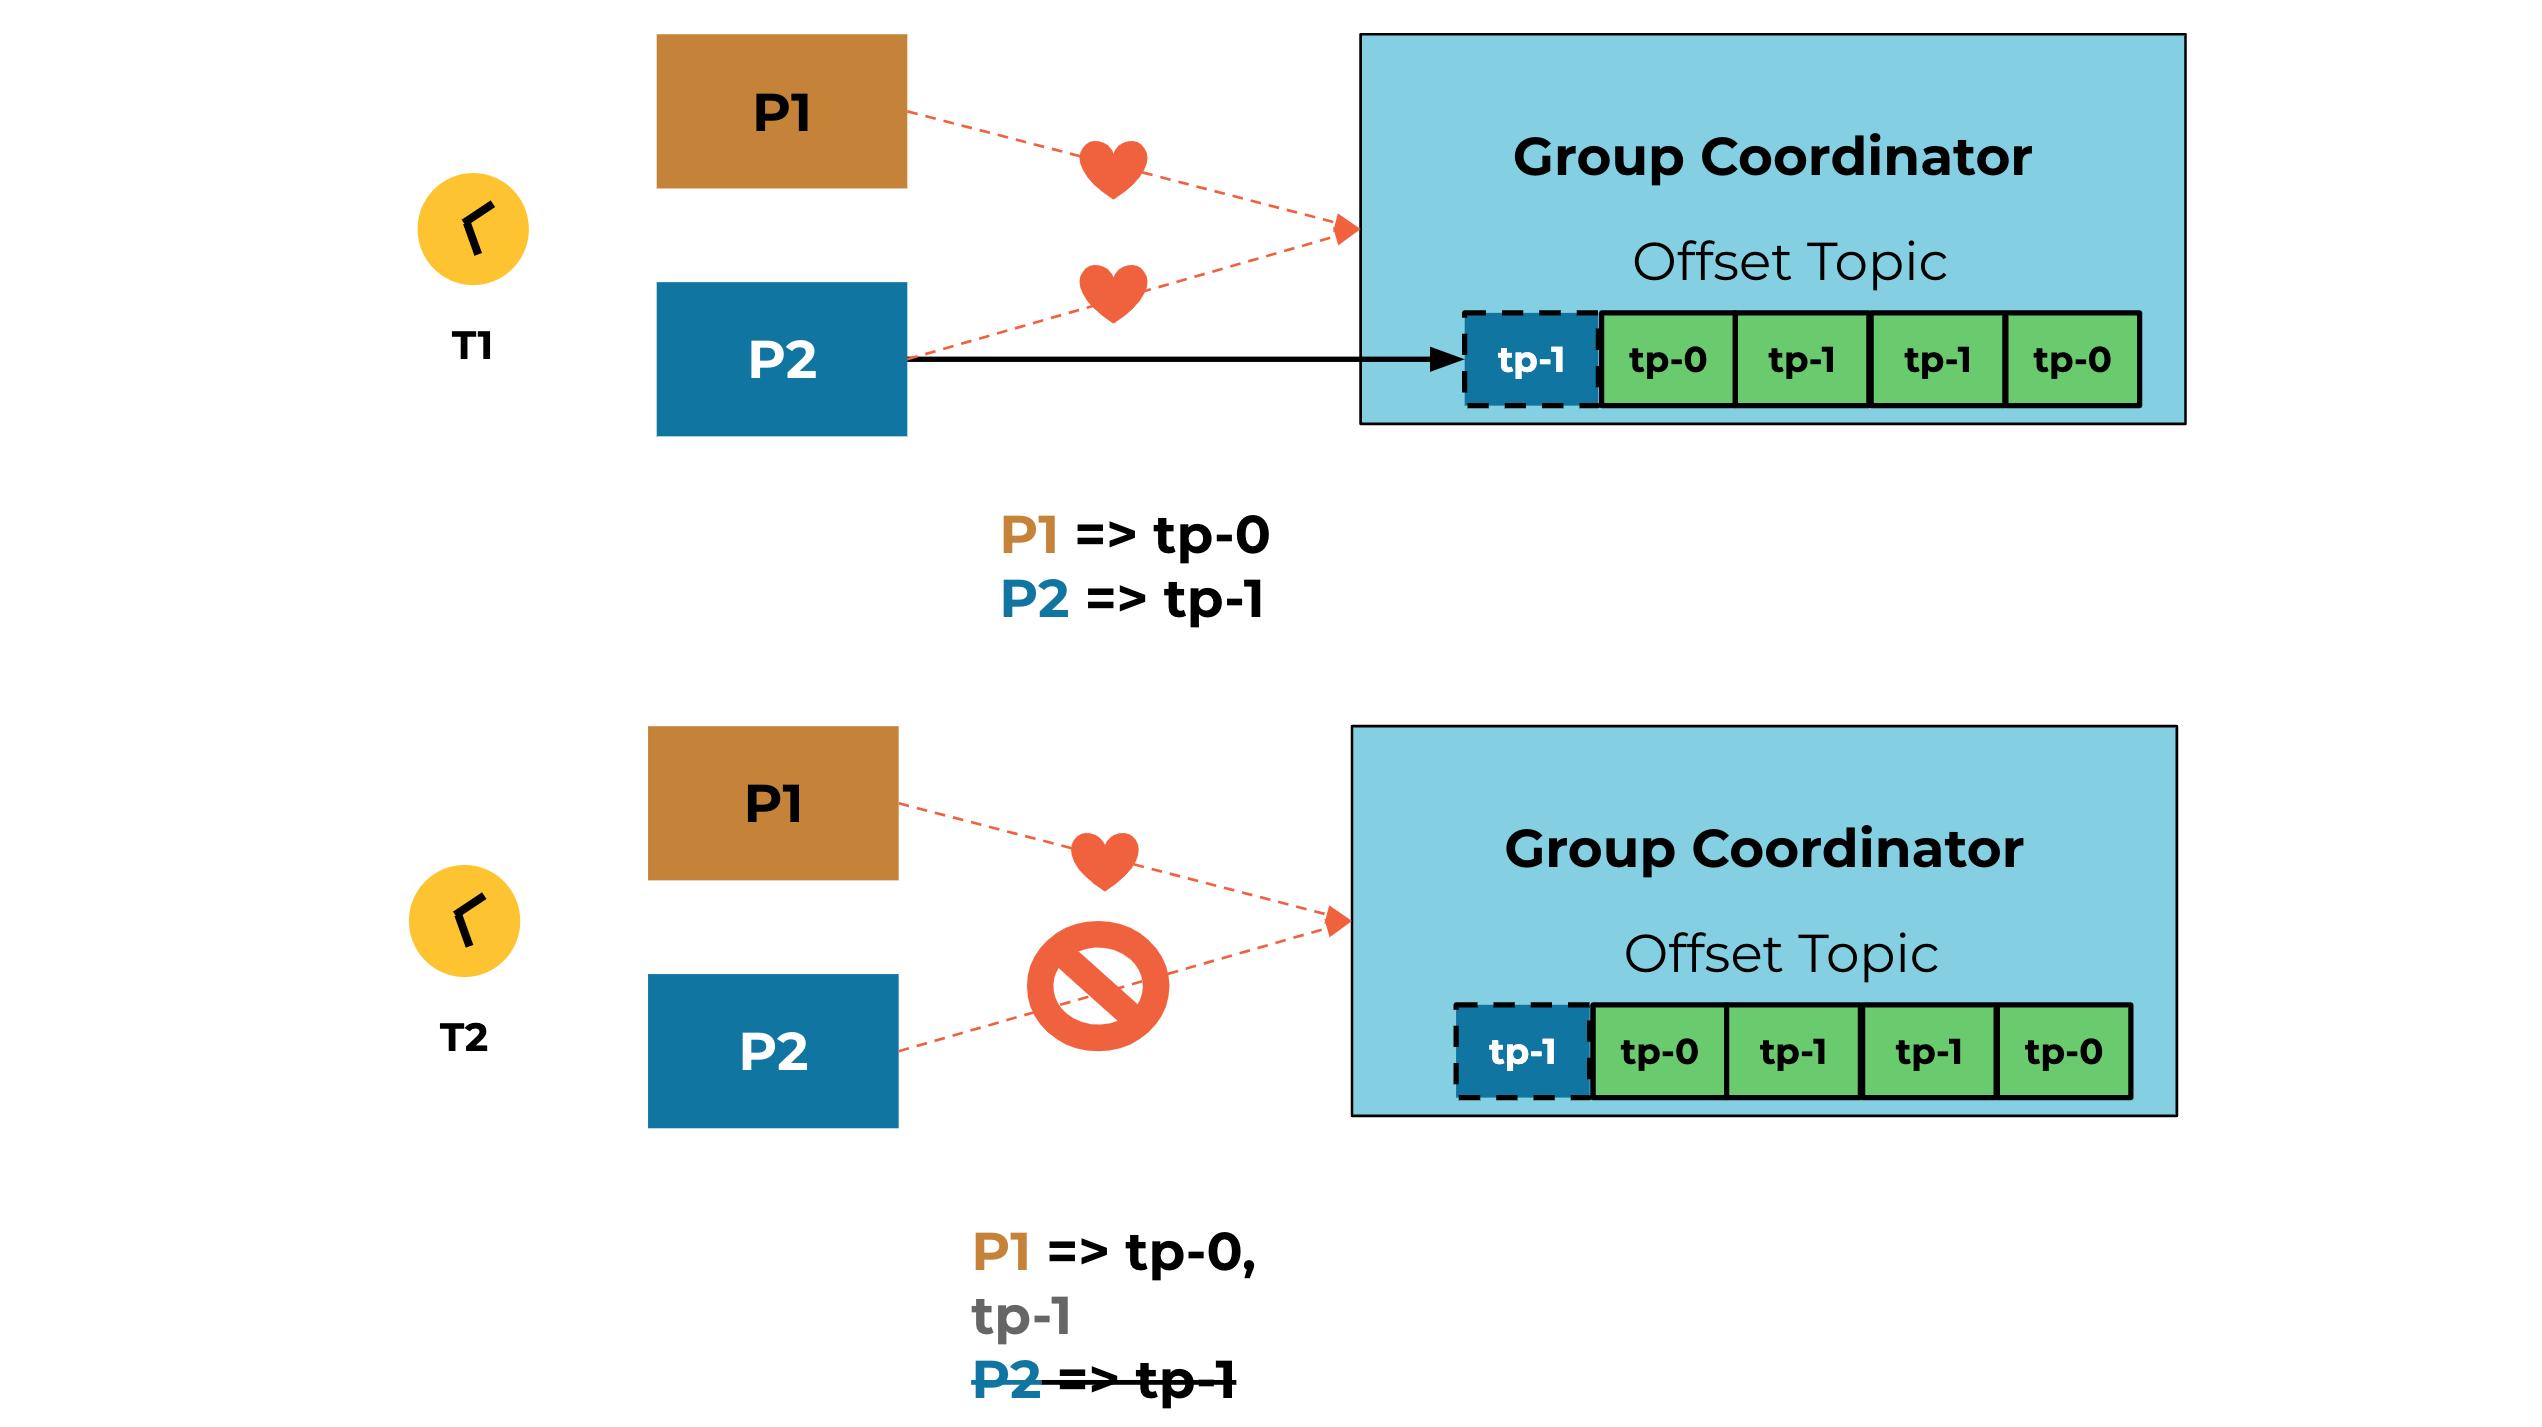 Group Coordinator   Offset Topic